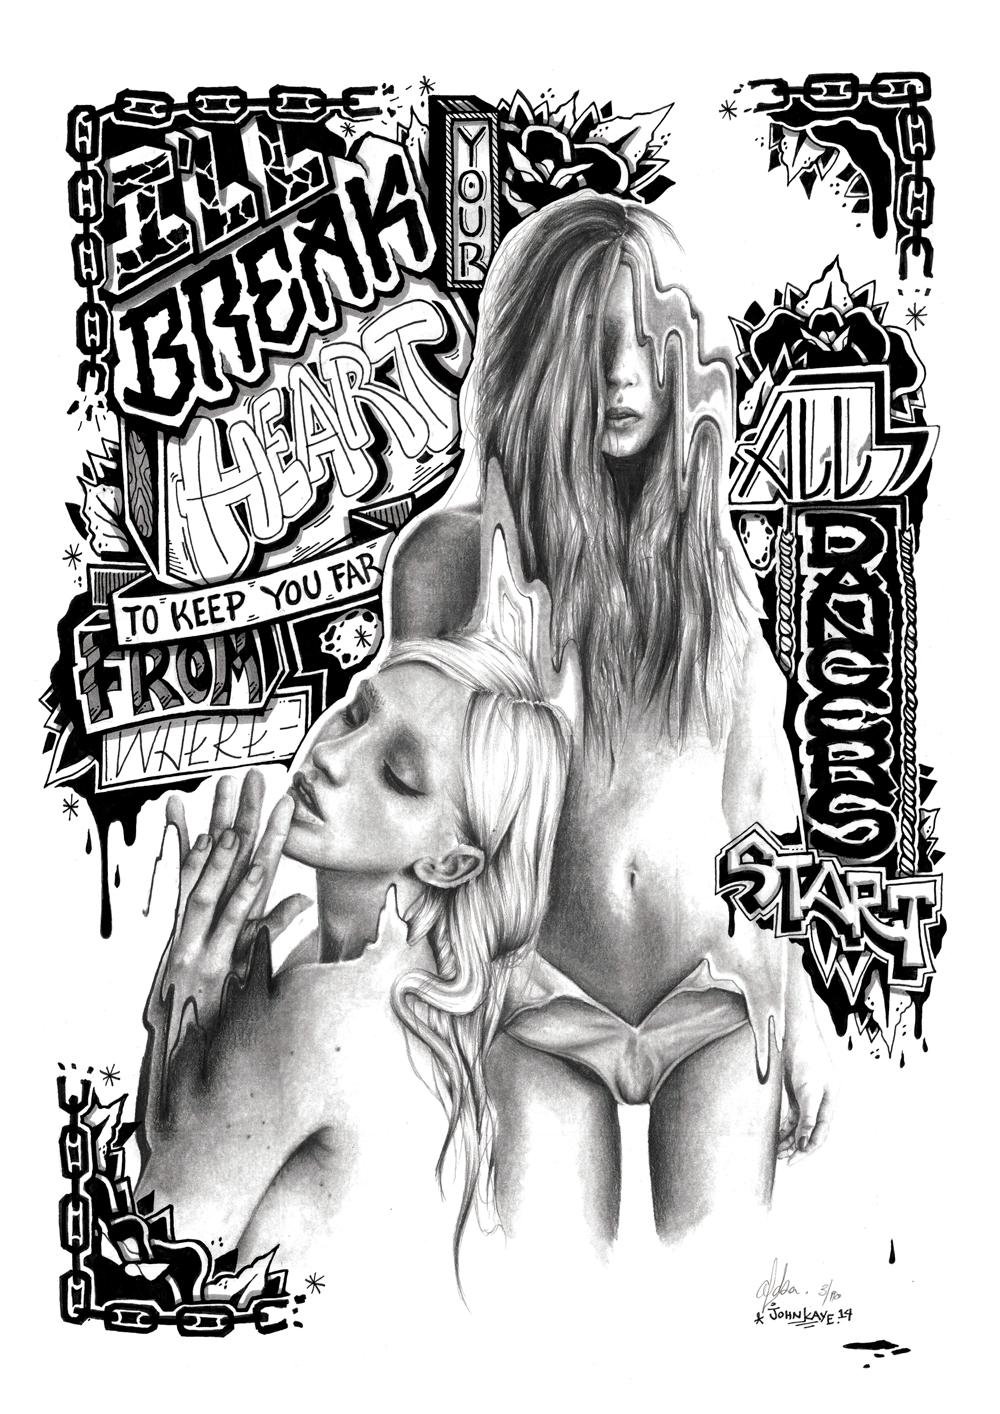 Lusid Art X John Kaye, 2014